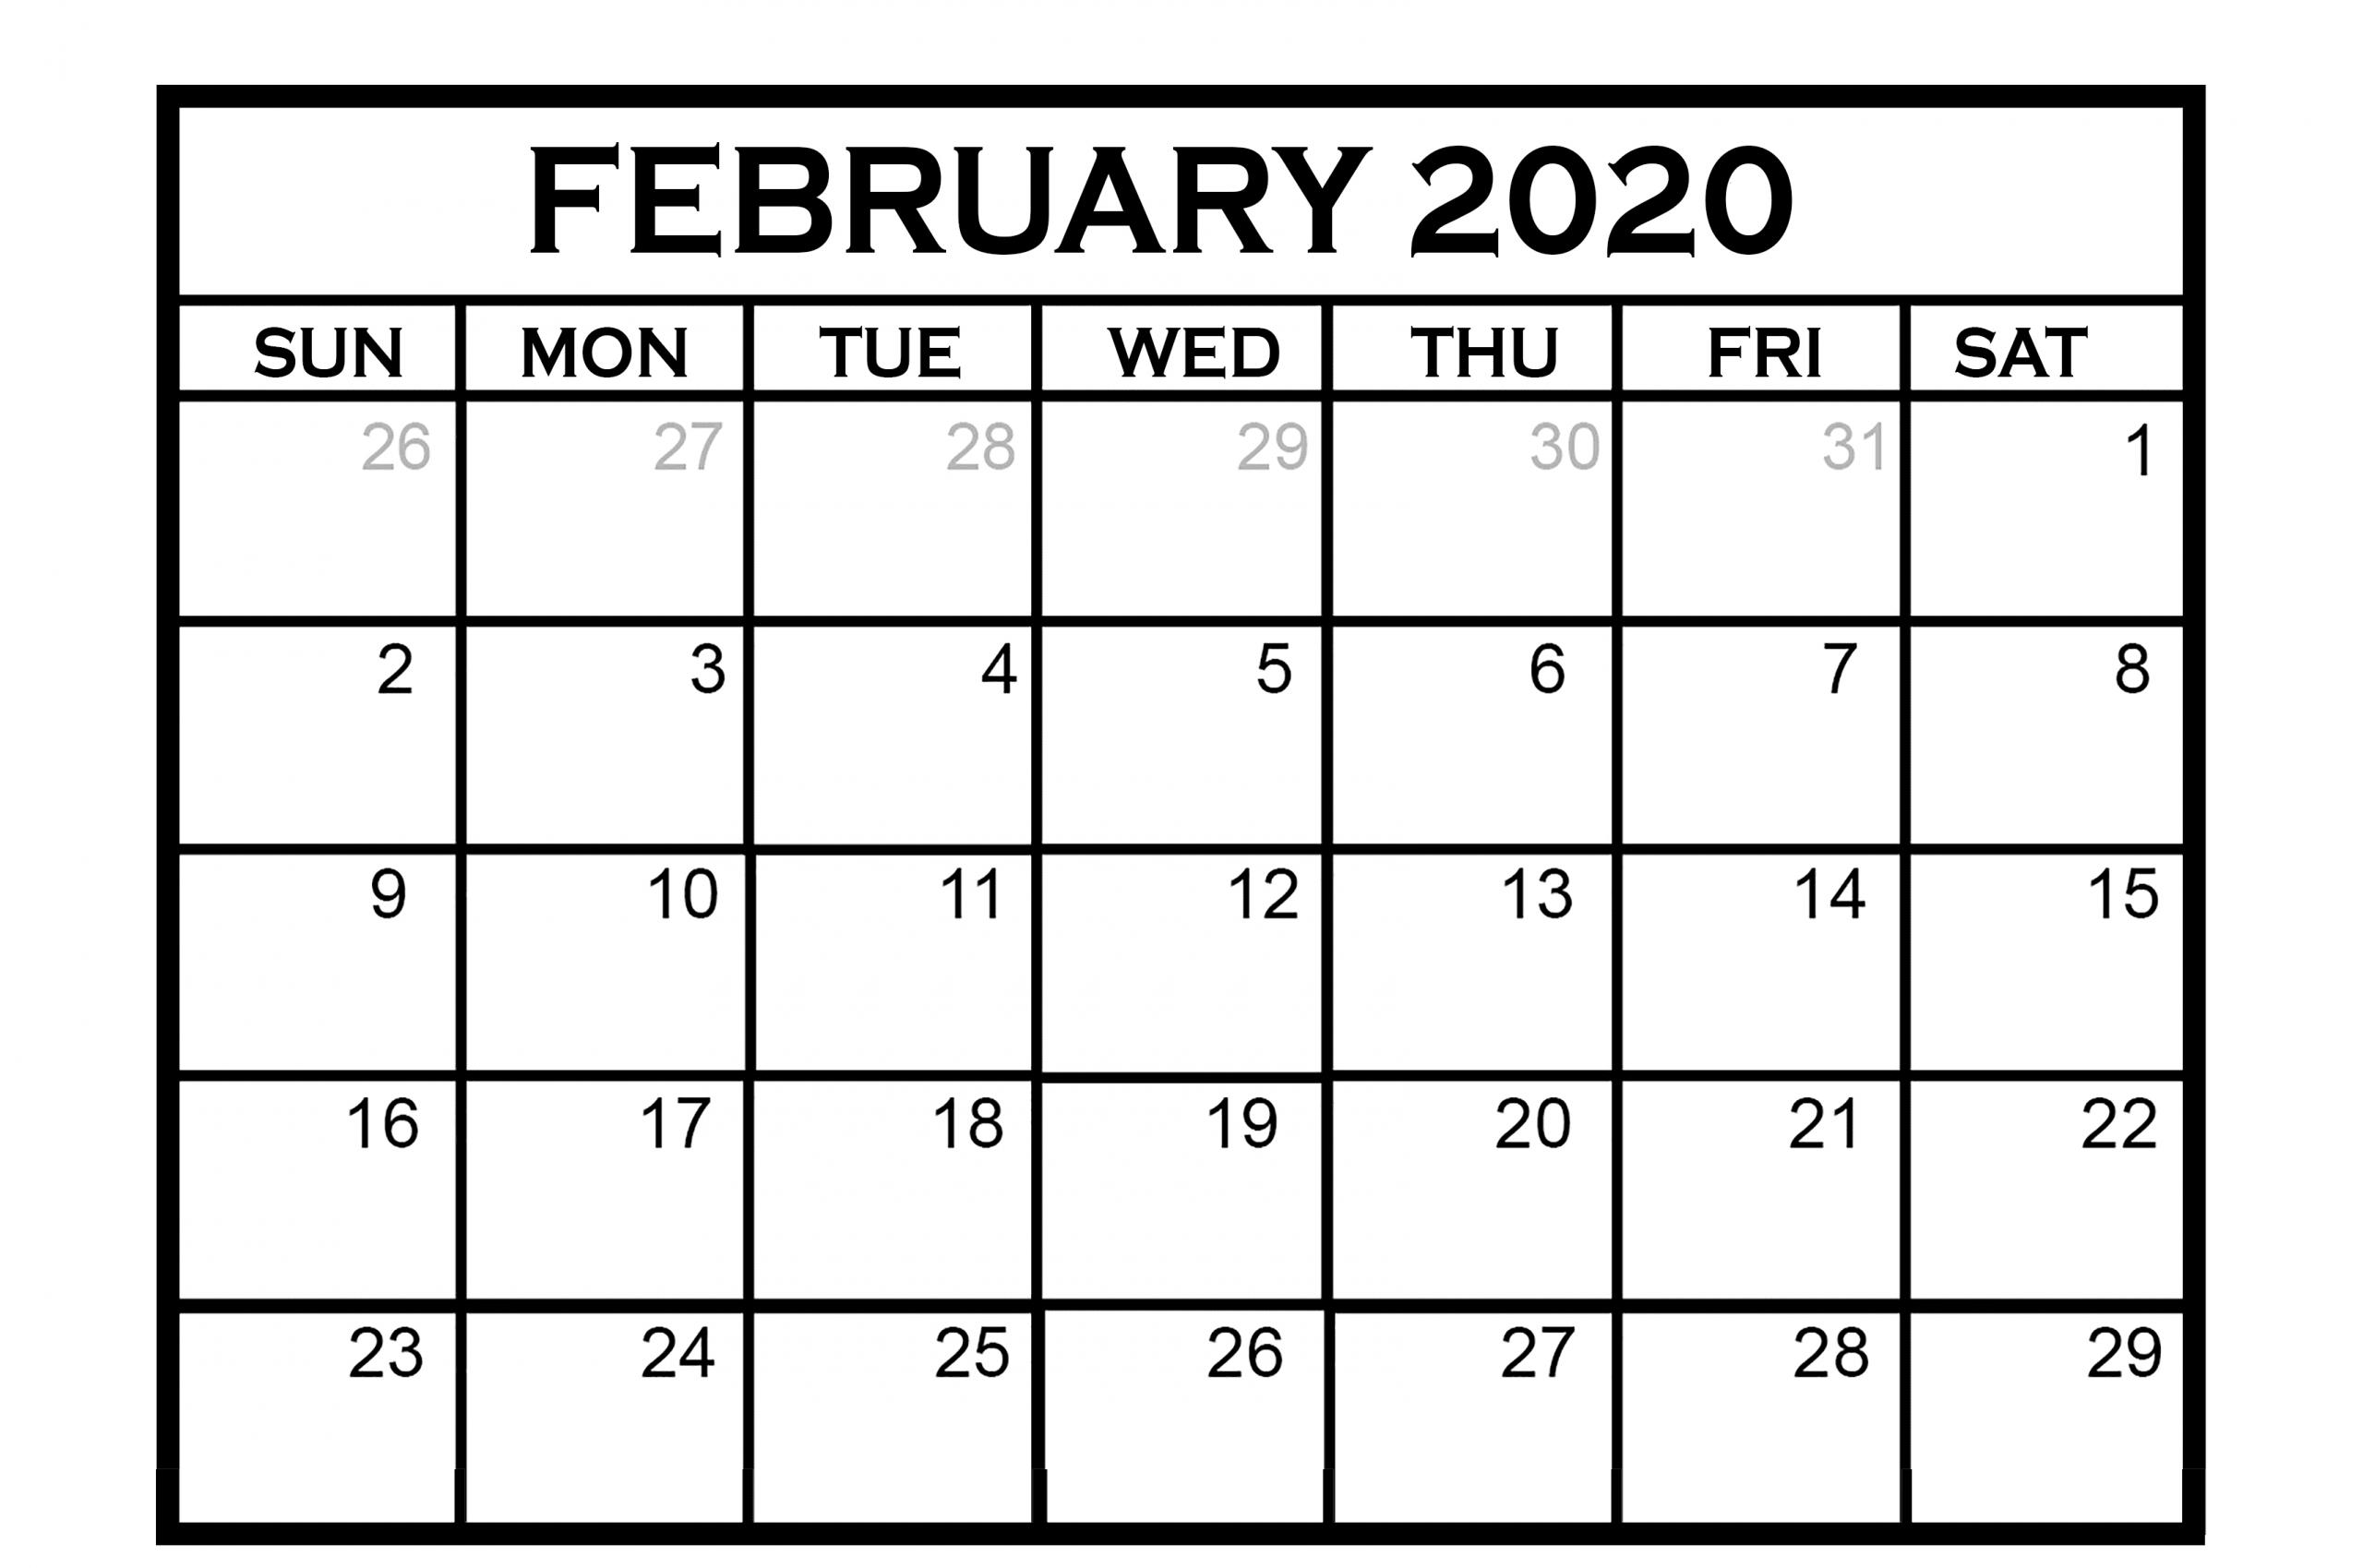 February 2020 Calendar Us Holidays, Events List | Free